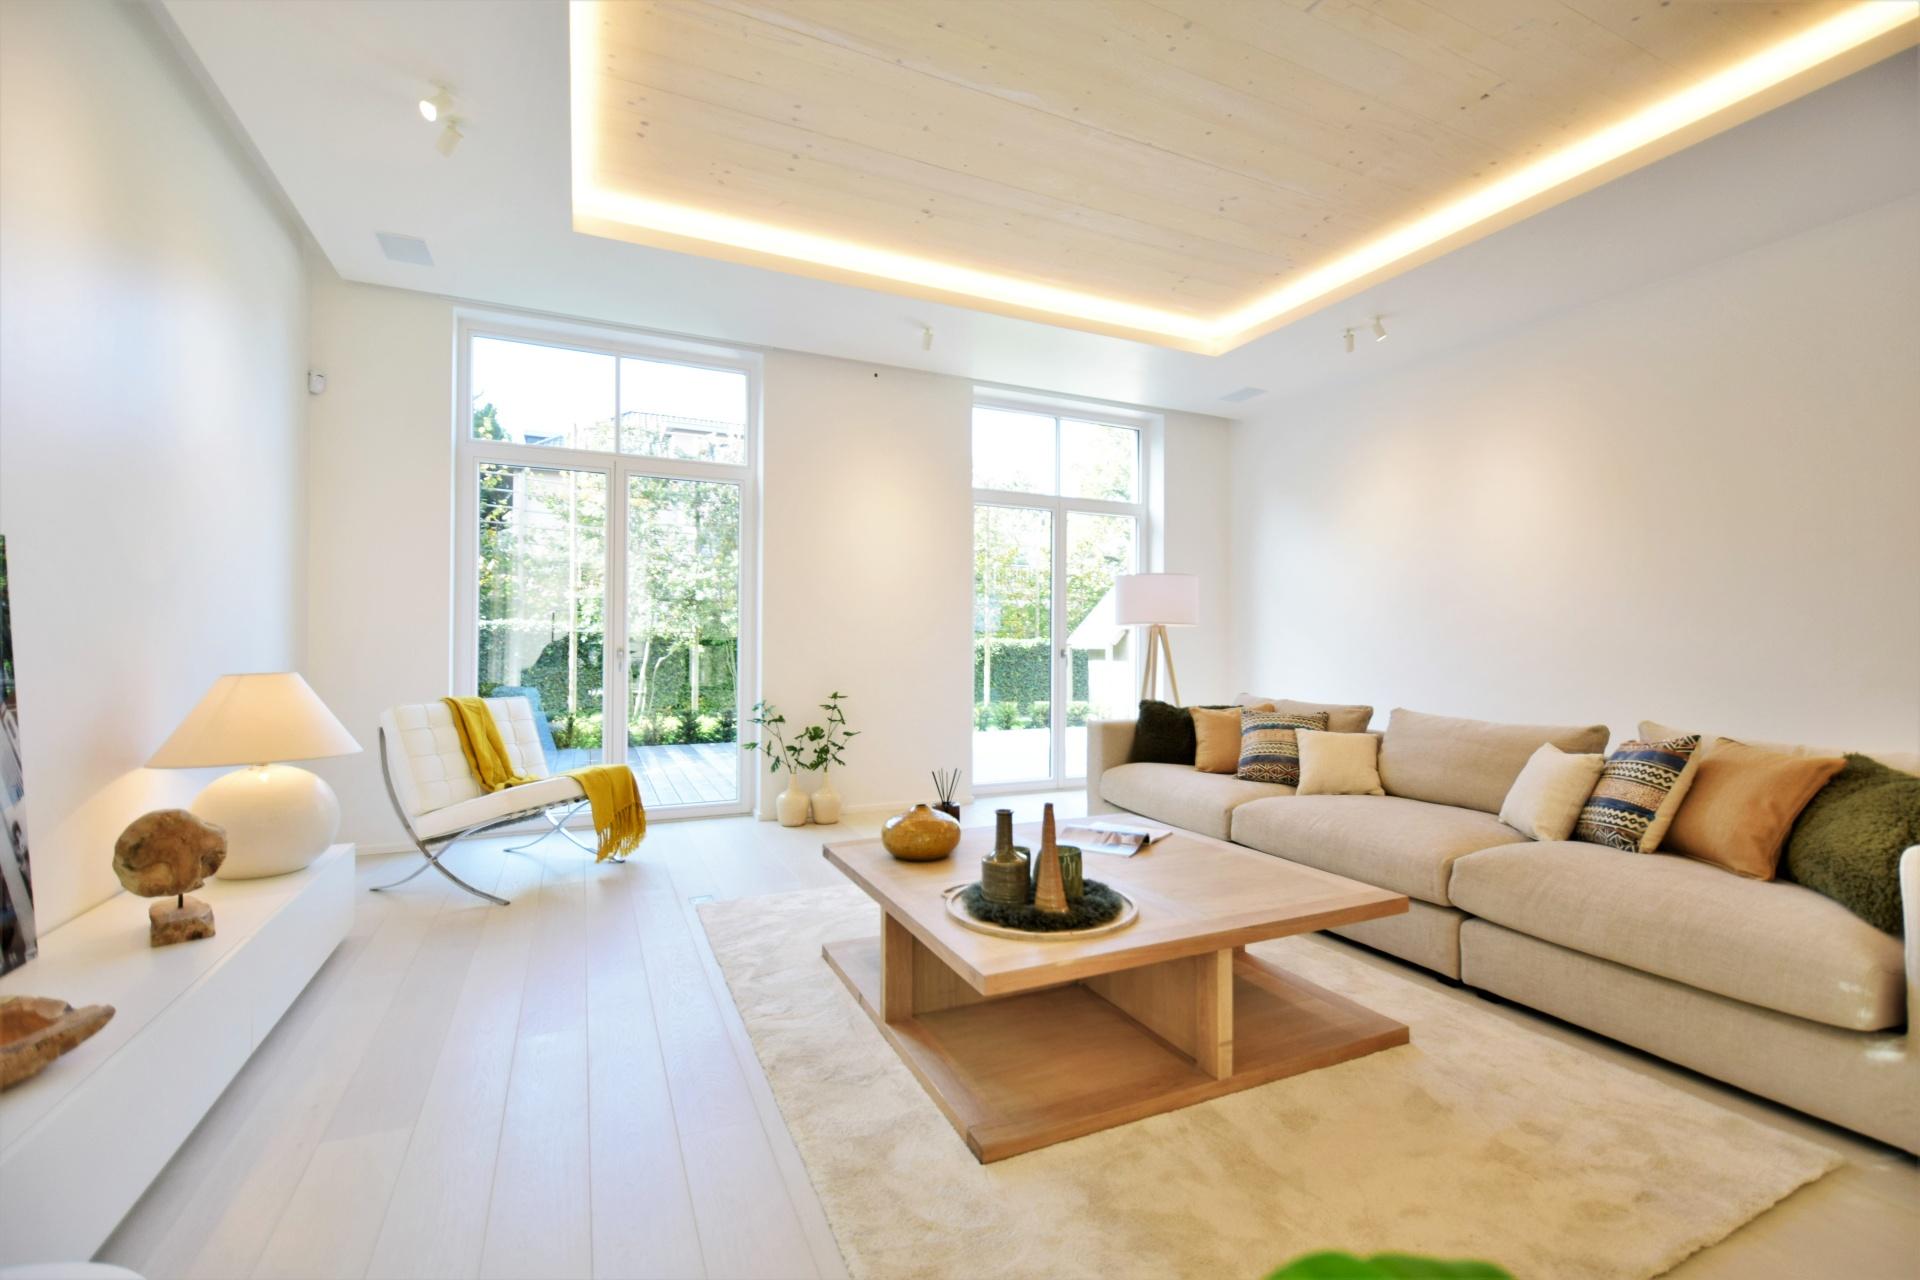 luxe villa, ukkel, vastgoedstyling, propertystyling, stagingcompany